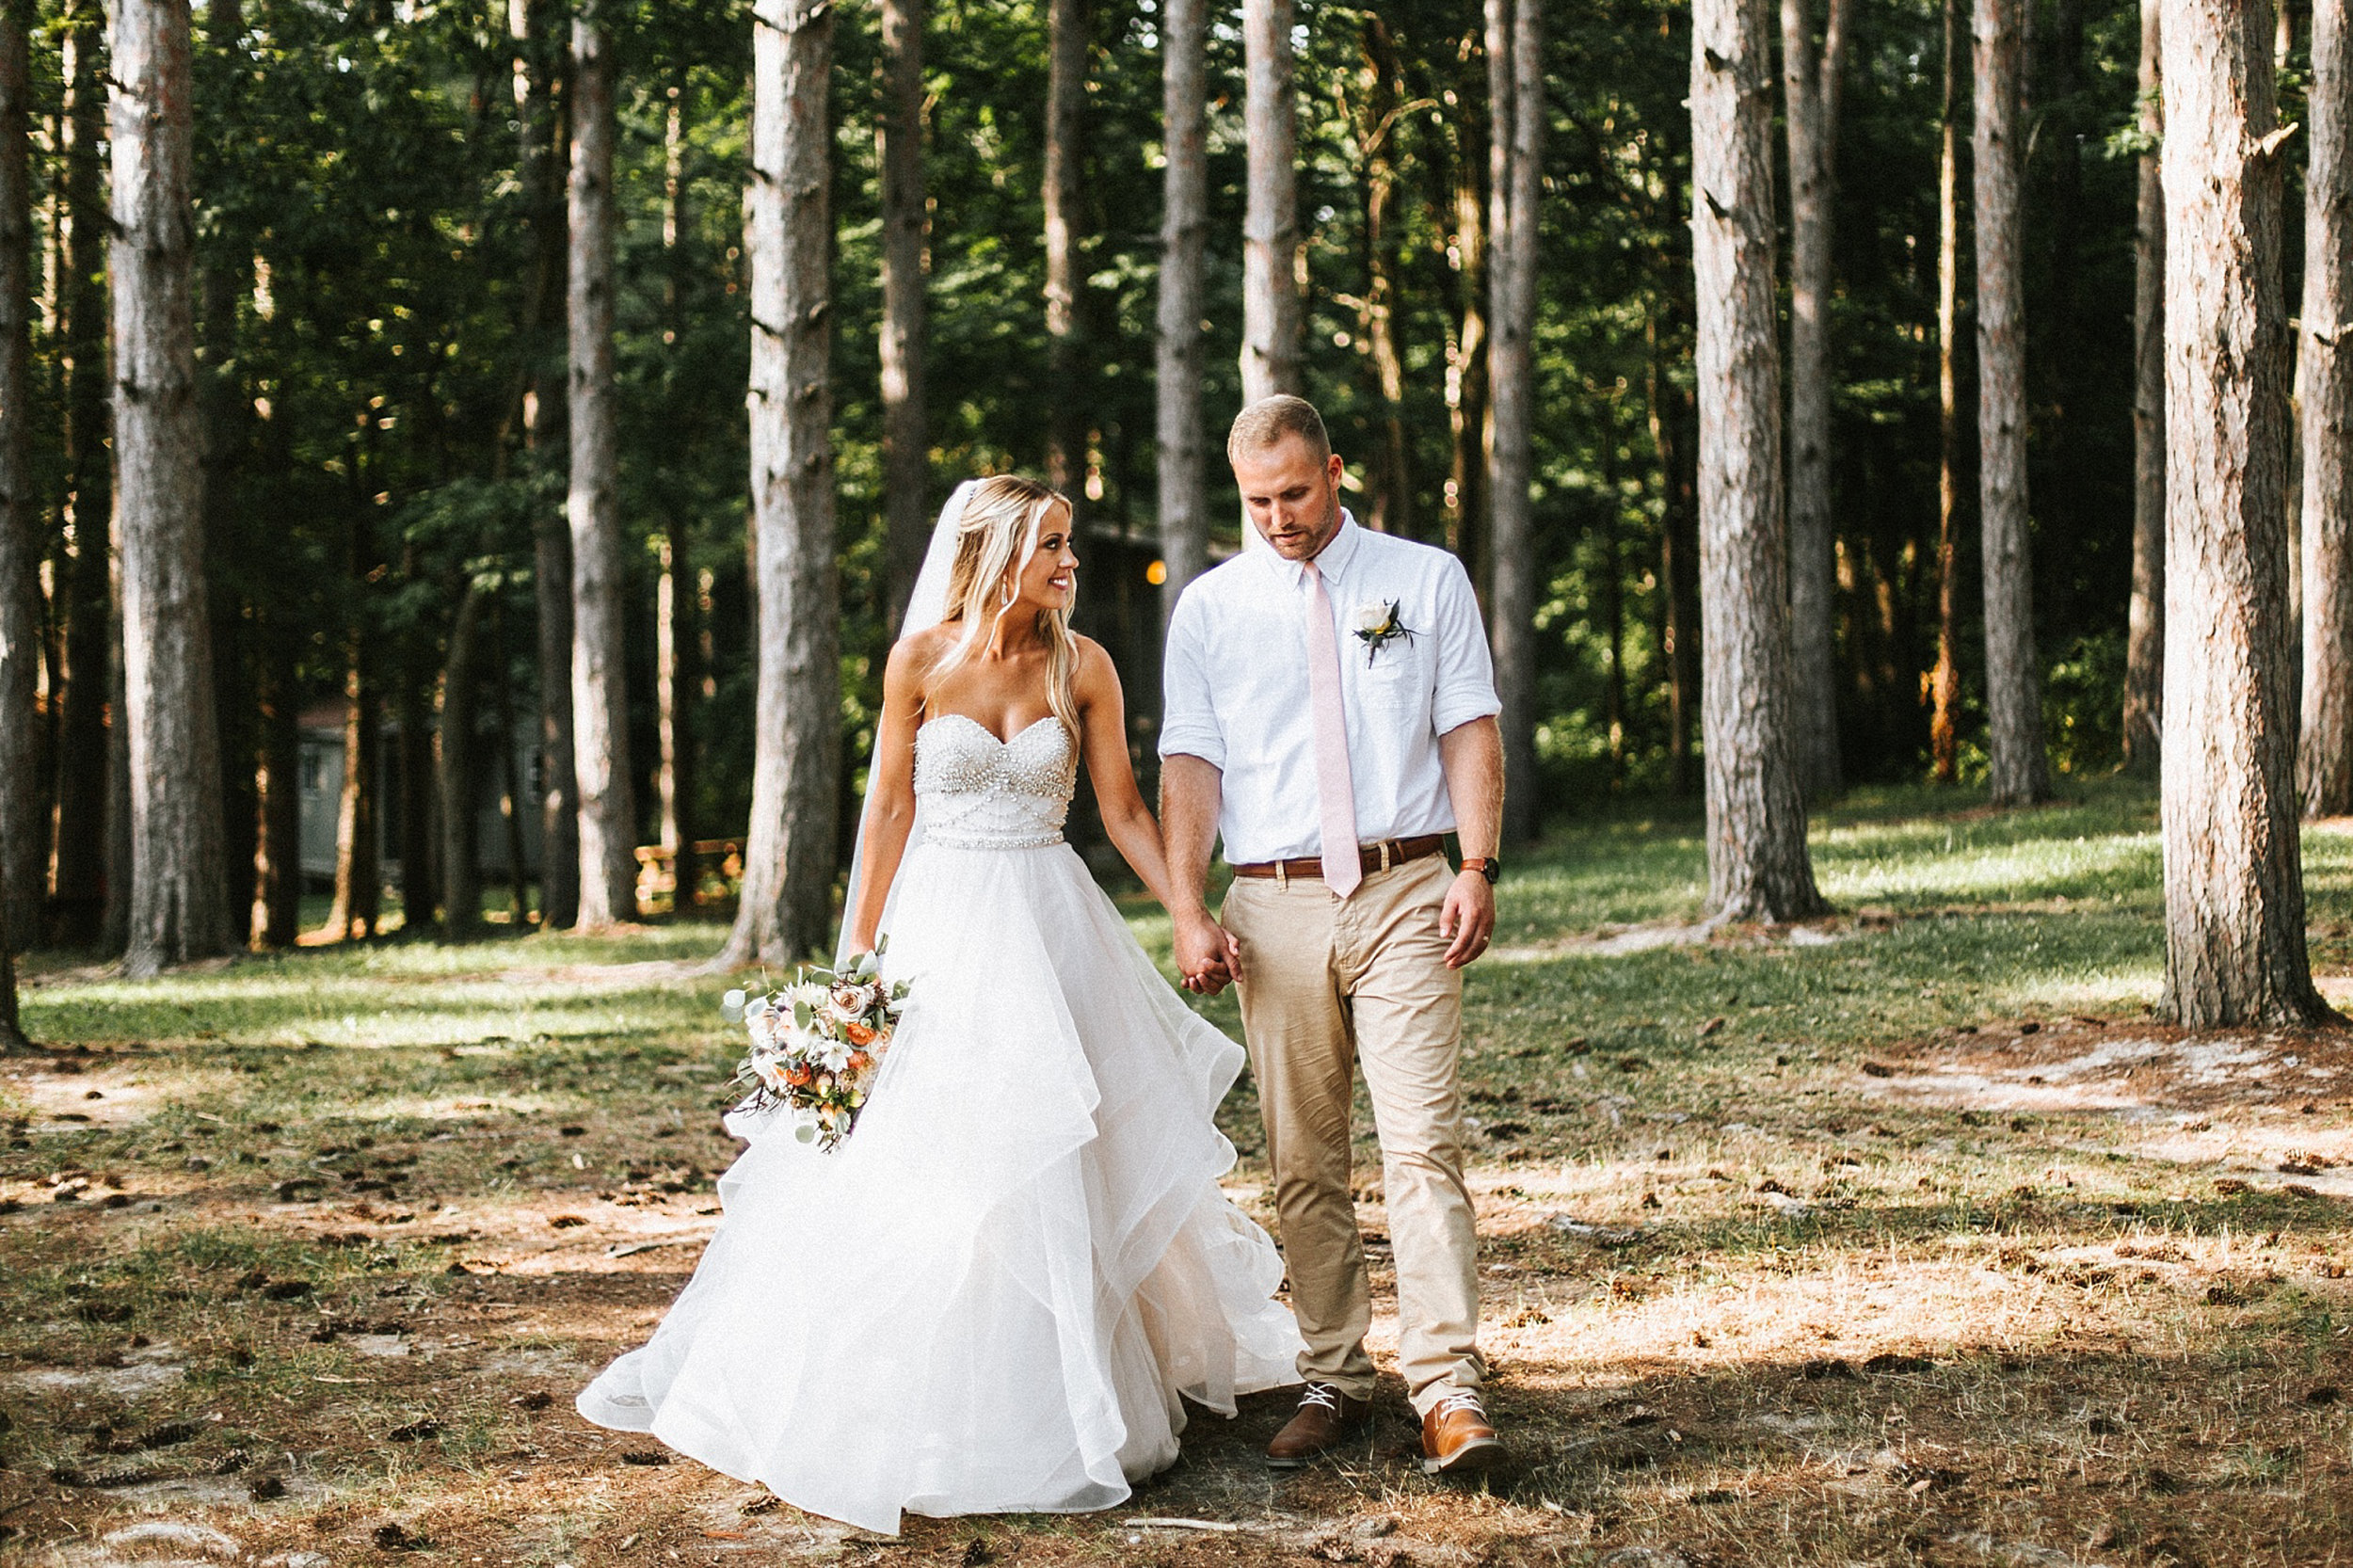 Brooke Townsend Photography - Cincinnati Wedding Photographer (108 of 153).jpg